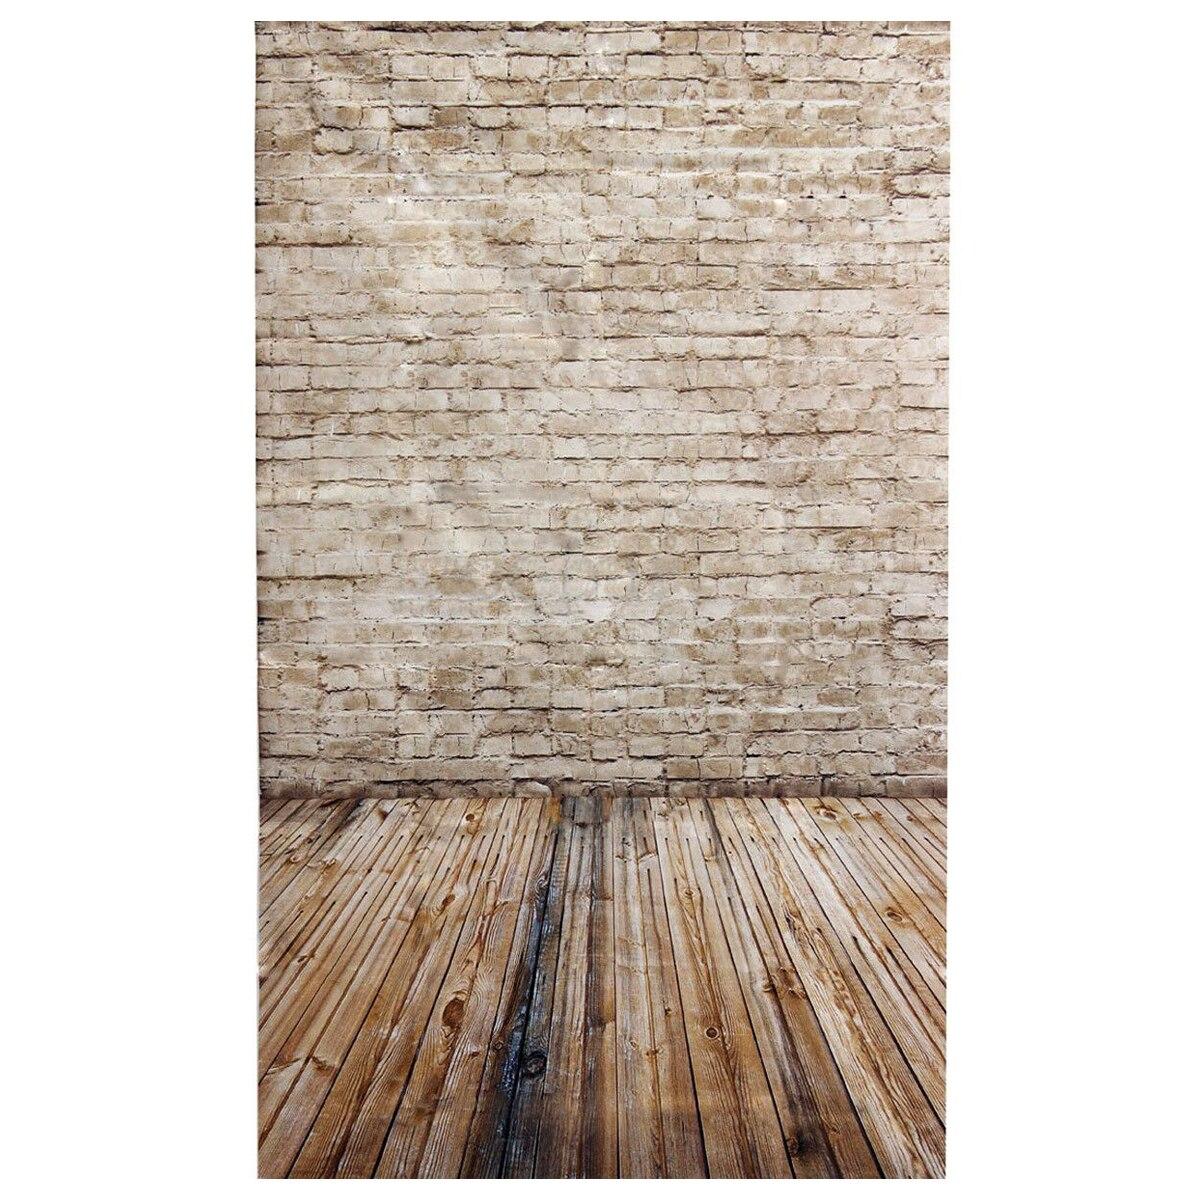 3x5FT Brick Wall Photography Backdrop Photo Wooden Floor Studio Background Props Light Grey